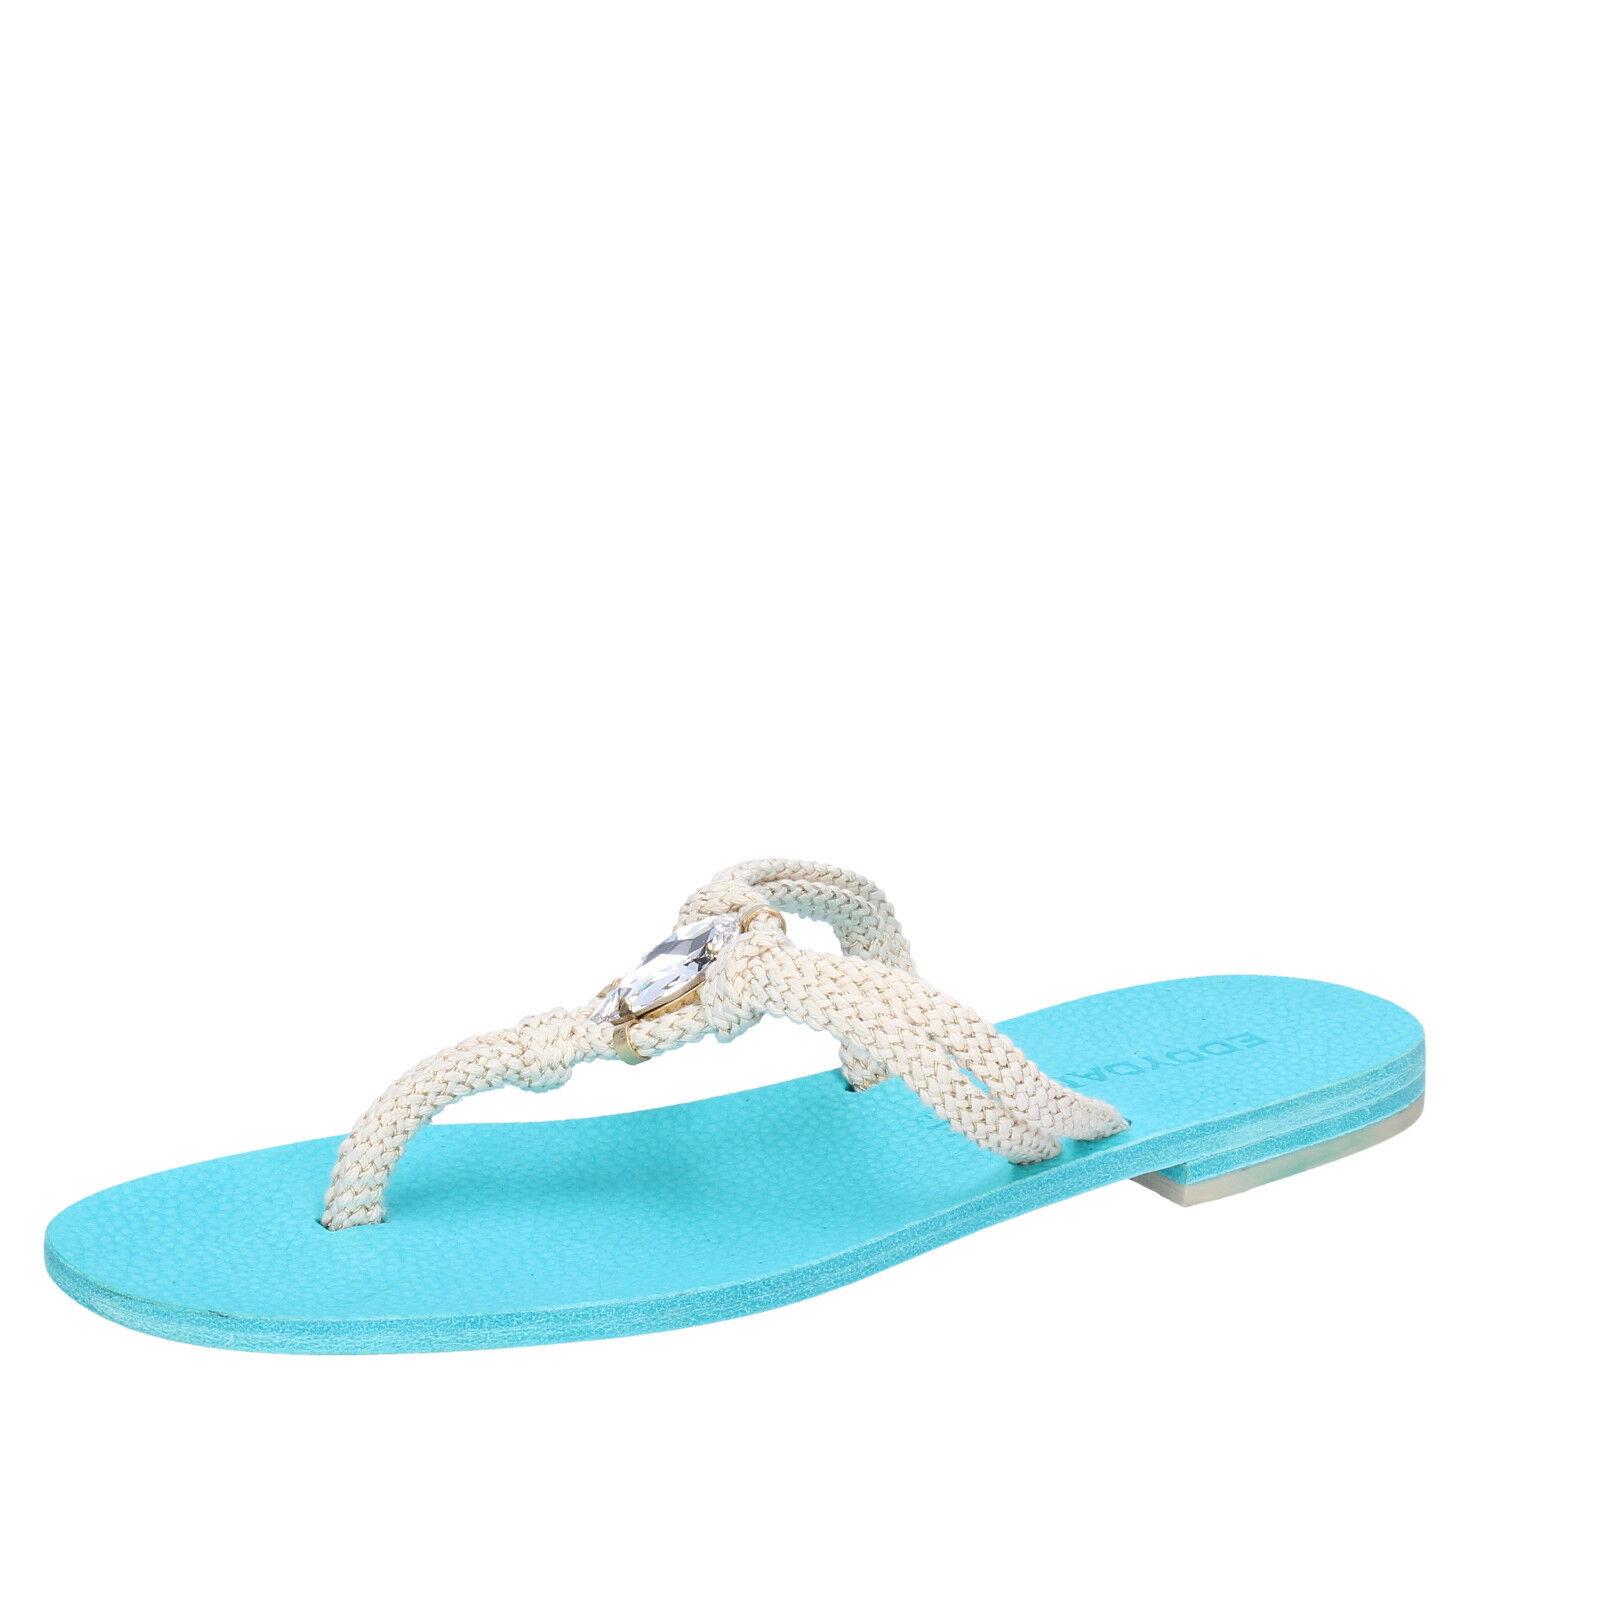 Chaussures Femmes Eddy Daniele 37 UE Sandales Blanc Corde Swarovski aw509